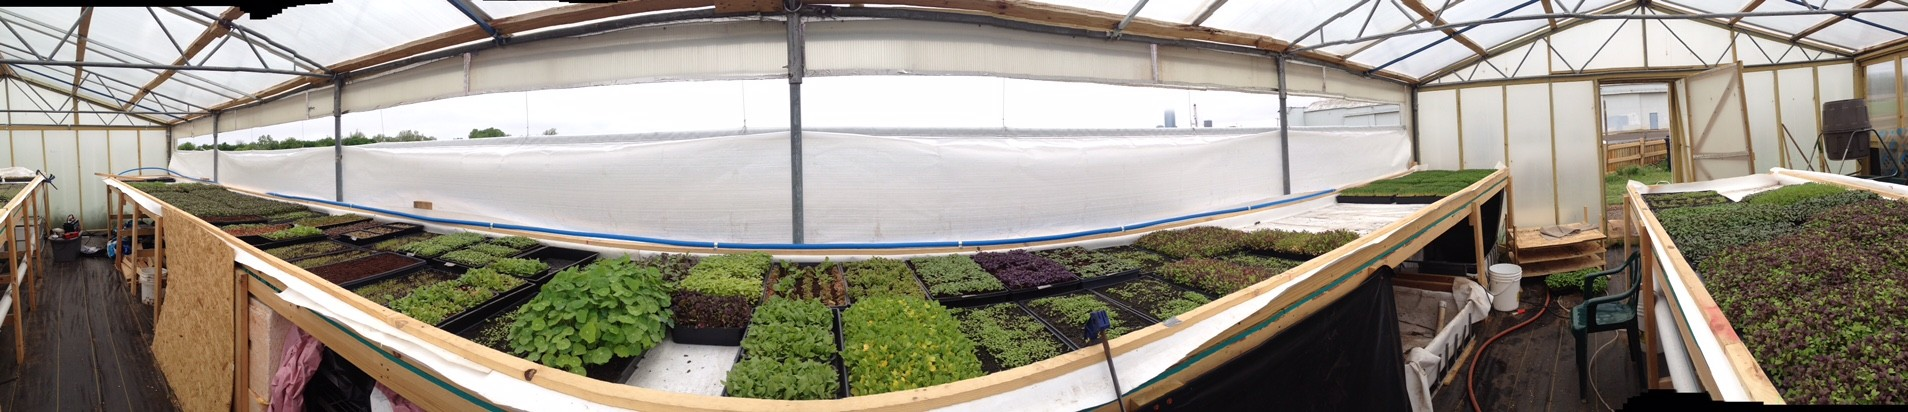 Greenhouse-pano.JPG